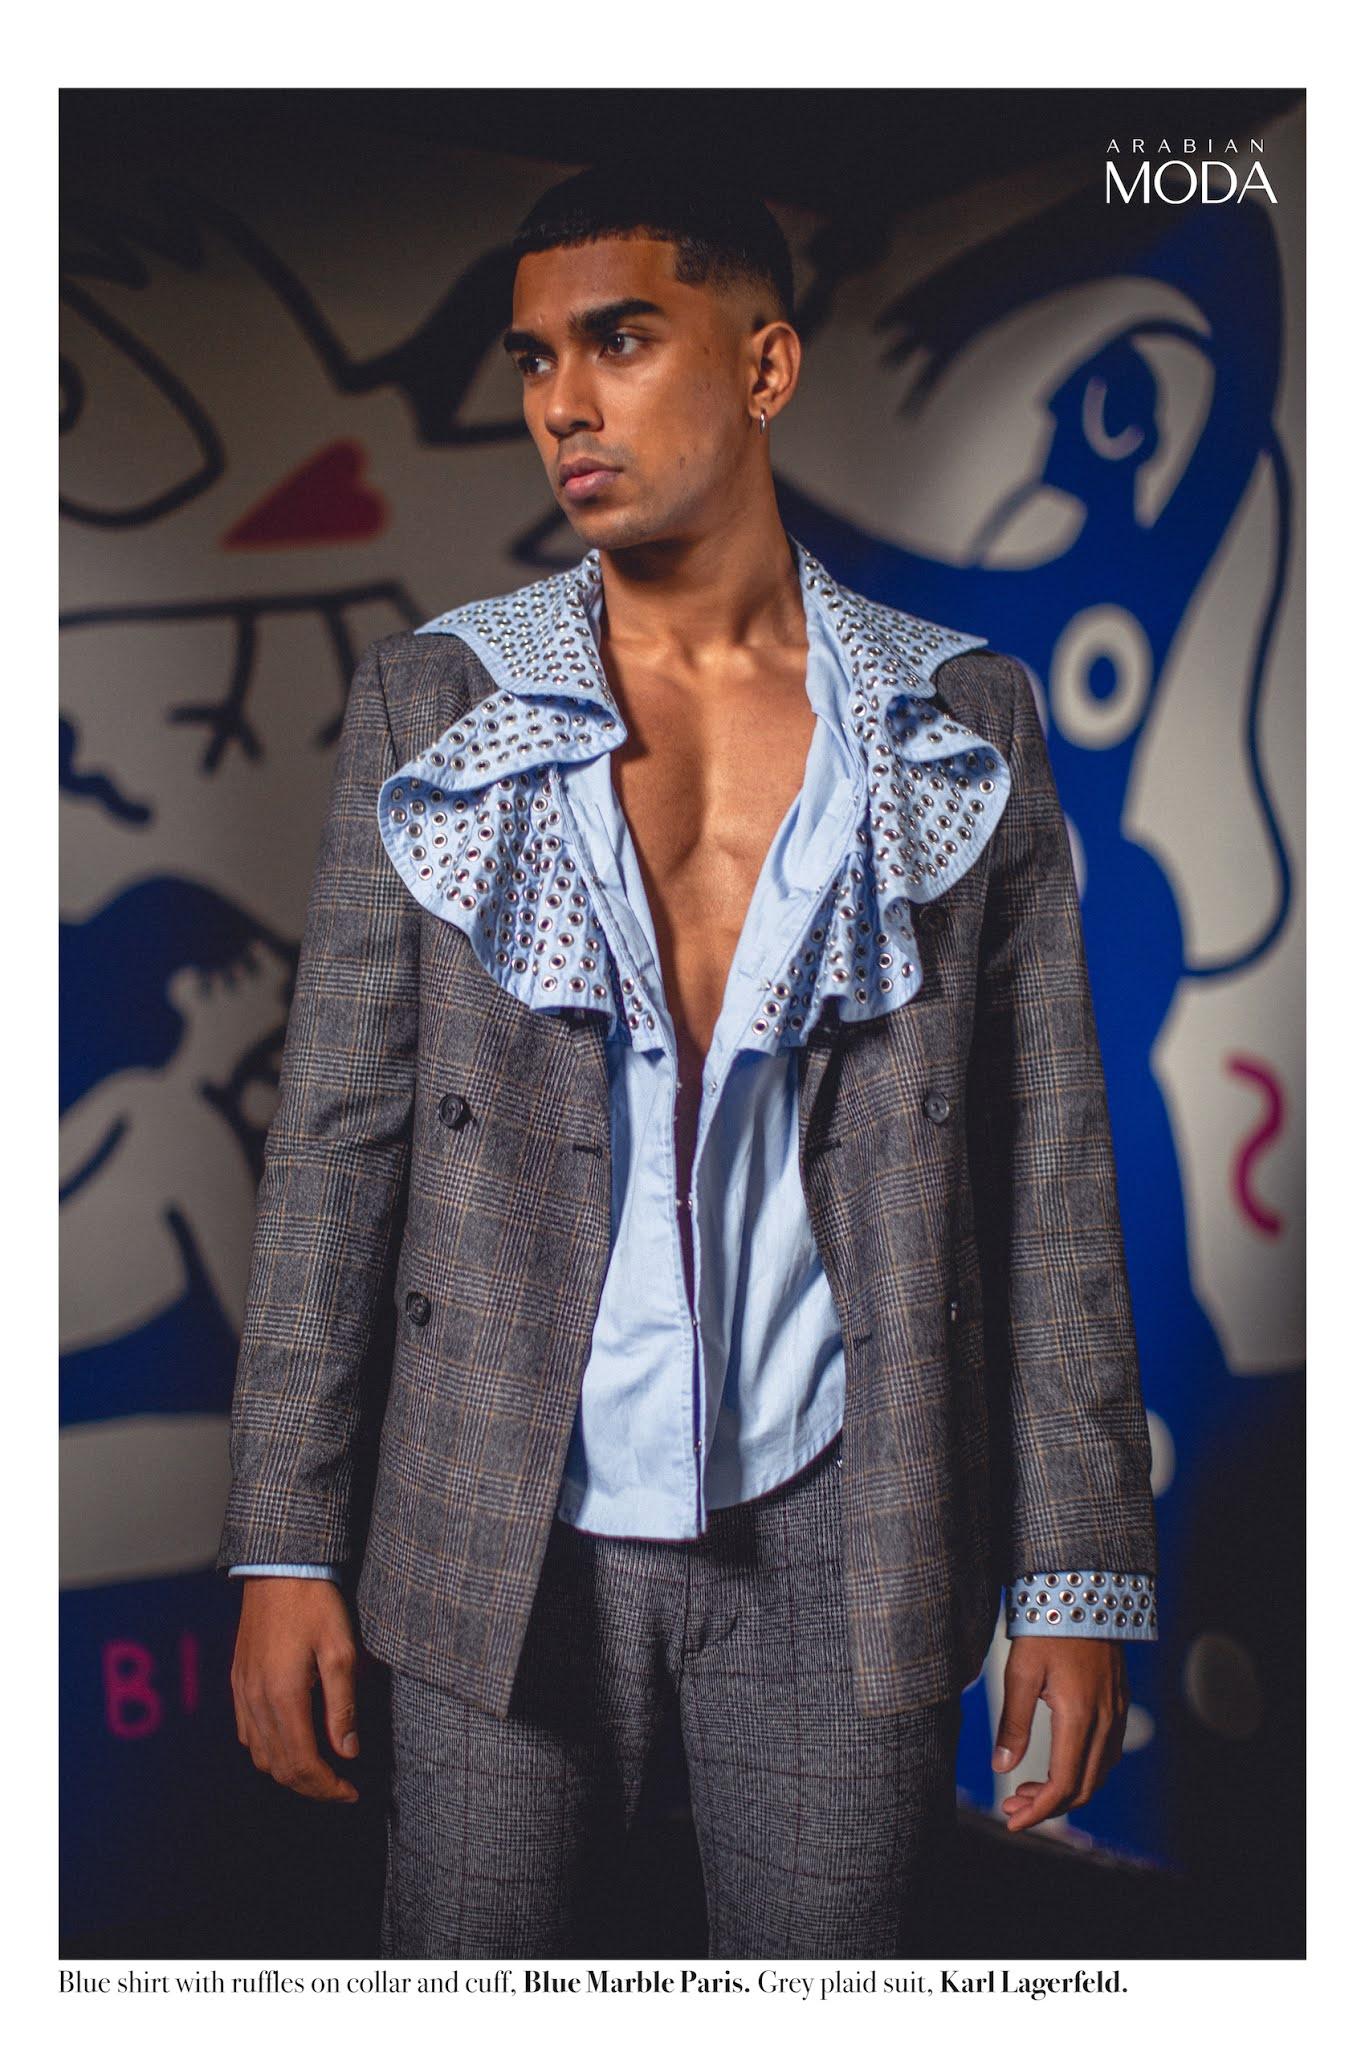 1- Arabian Moda x Blue Marble Paris x Lagerfeld